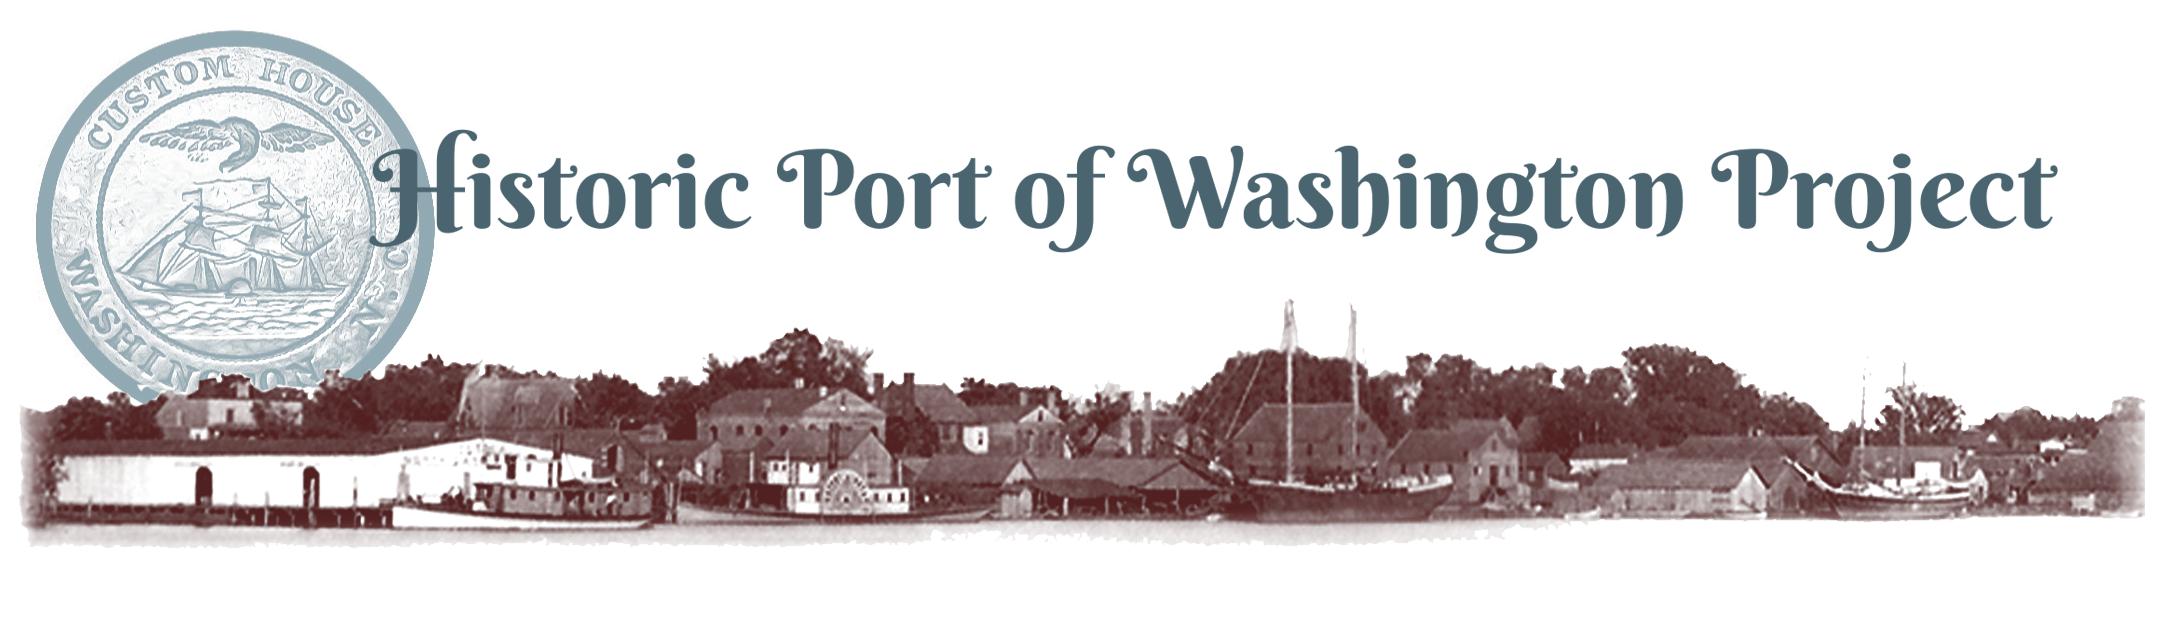 Historic Port of Washington Project